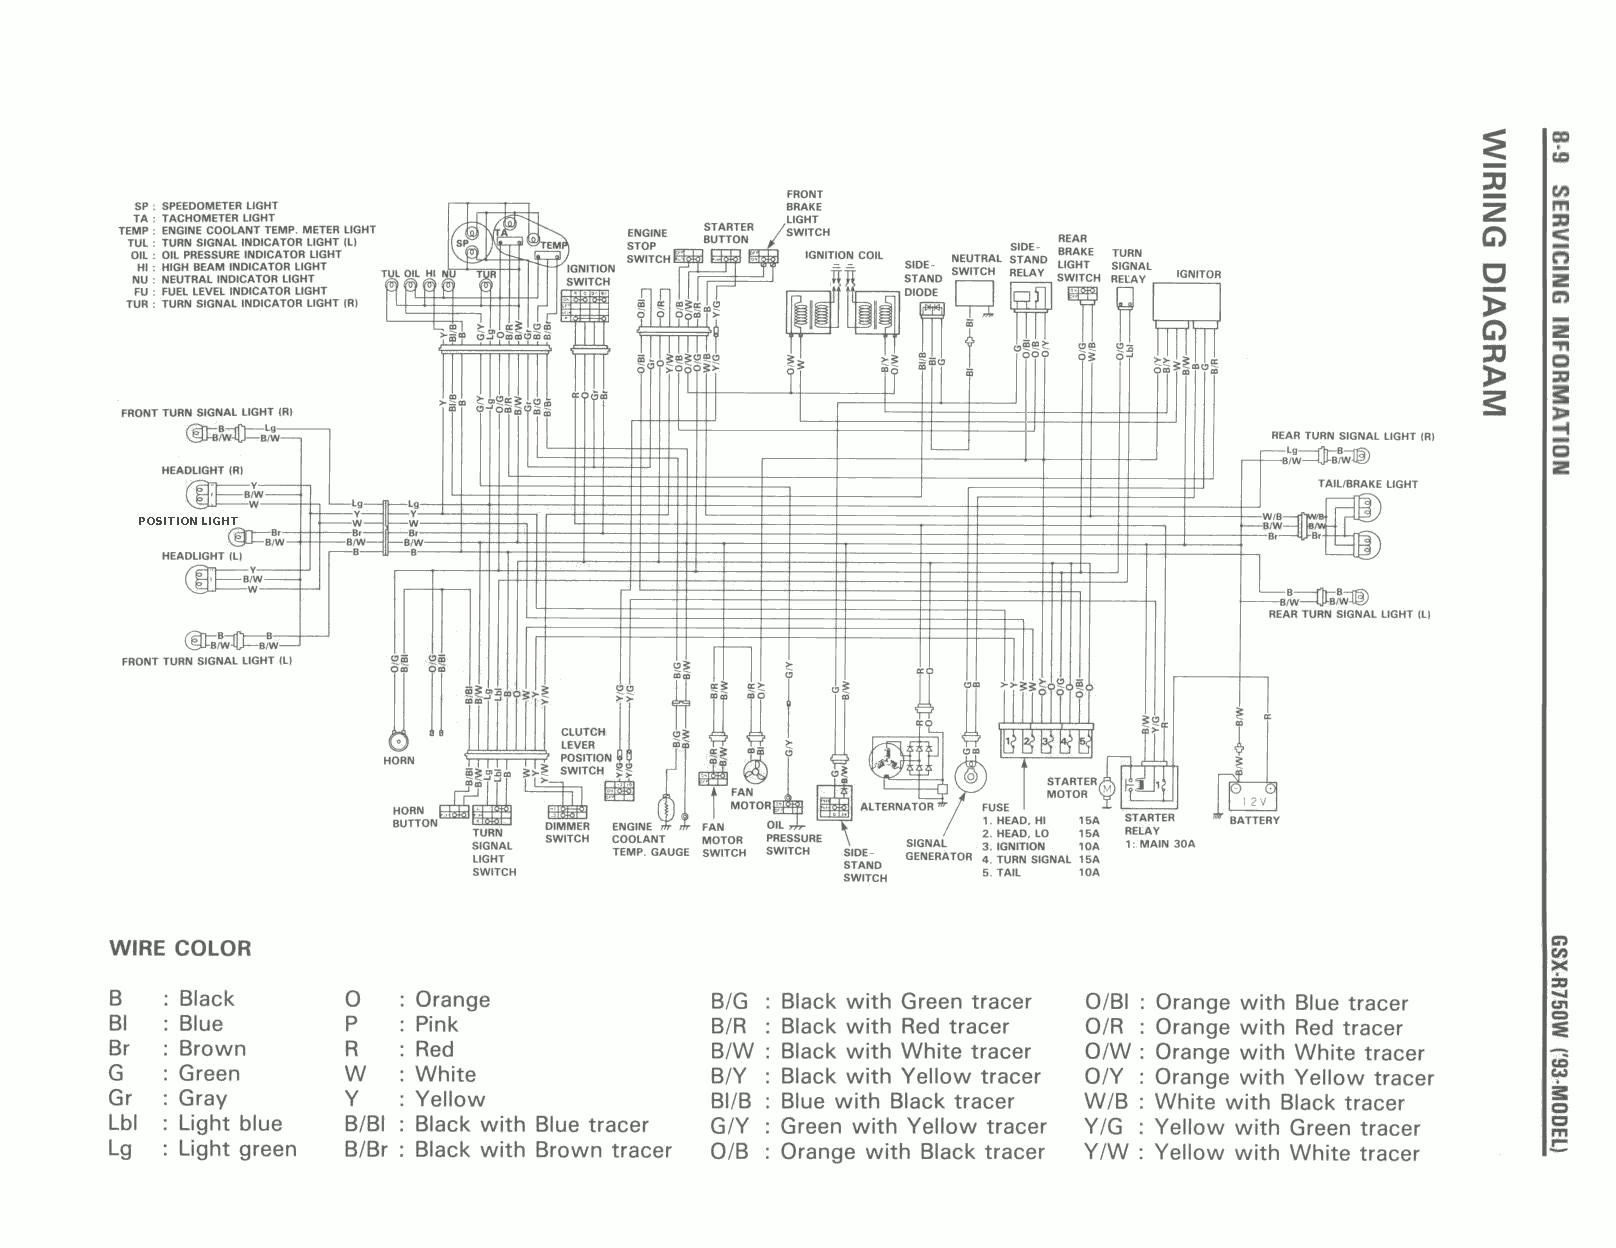 77 Ski Doo Wiring Diagram Schematics 2010 Renegade 85 Trusted 1997 Electrical